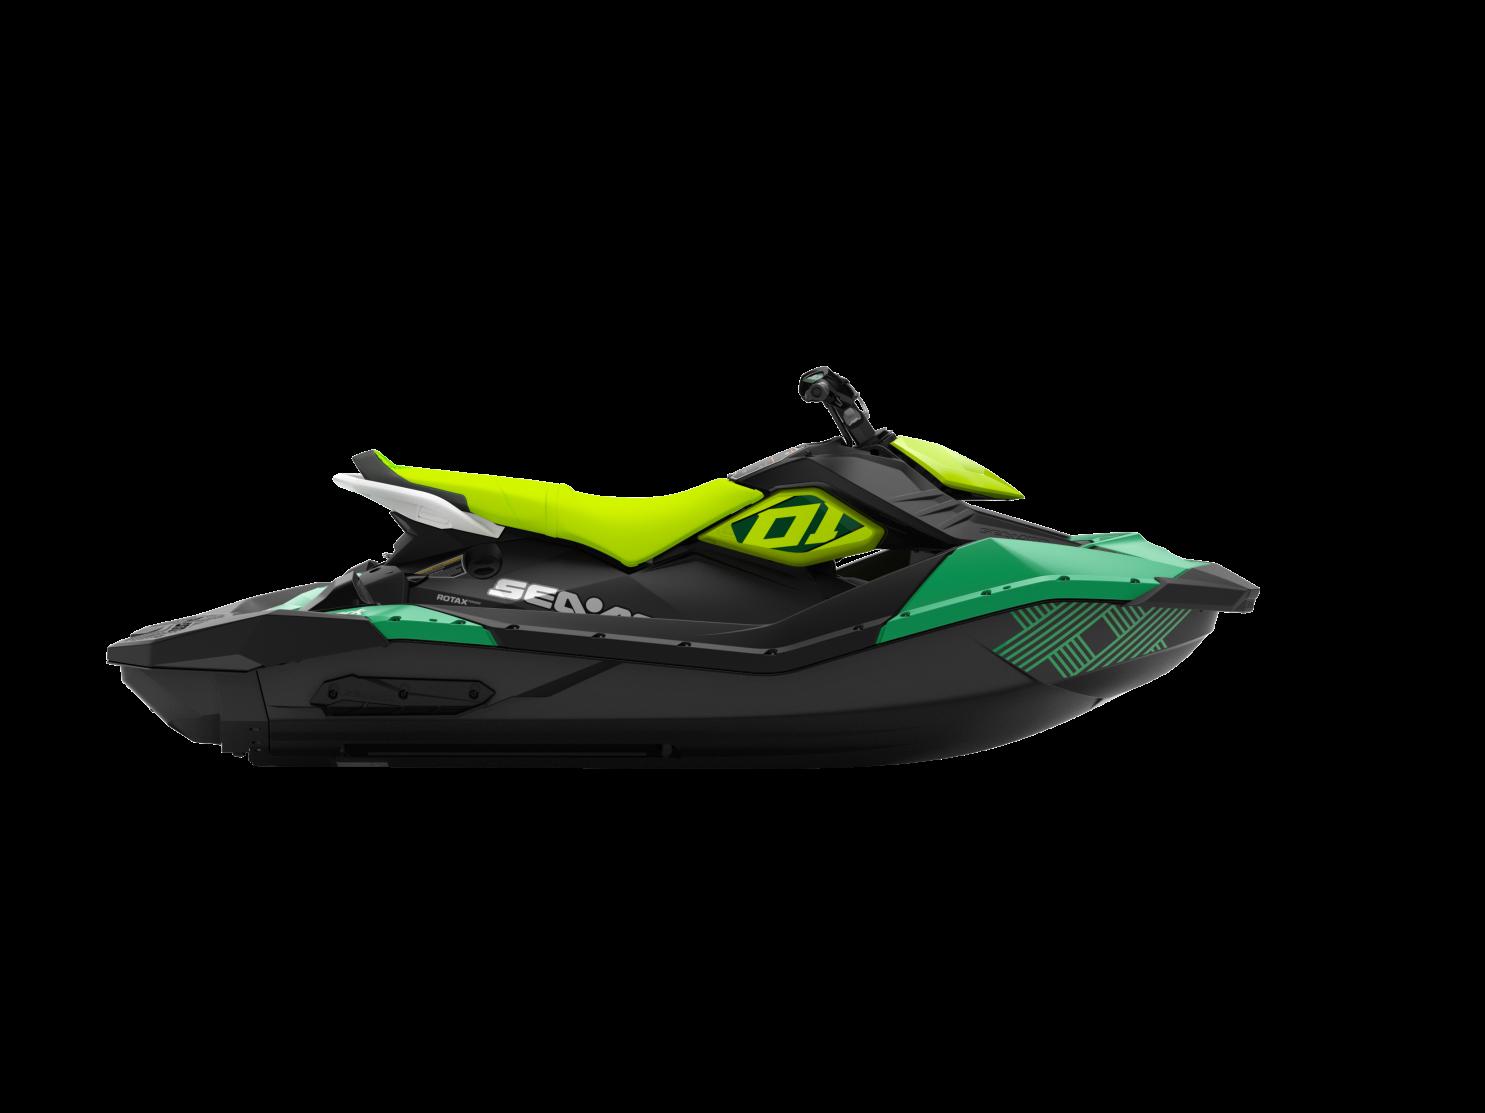 2021 Spark Trixx 3up